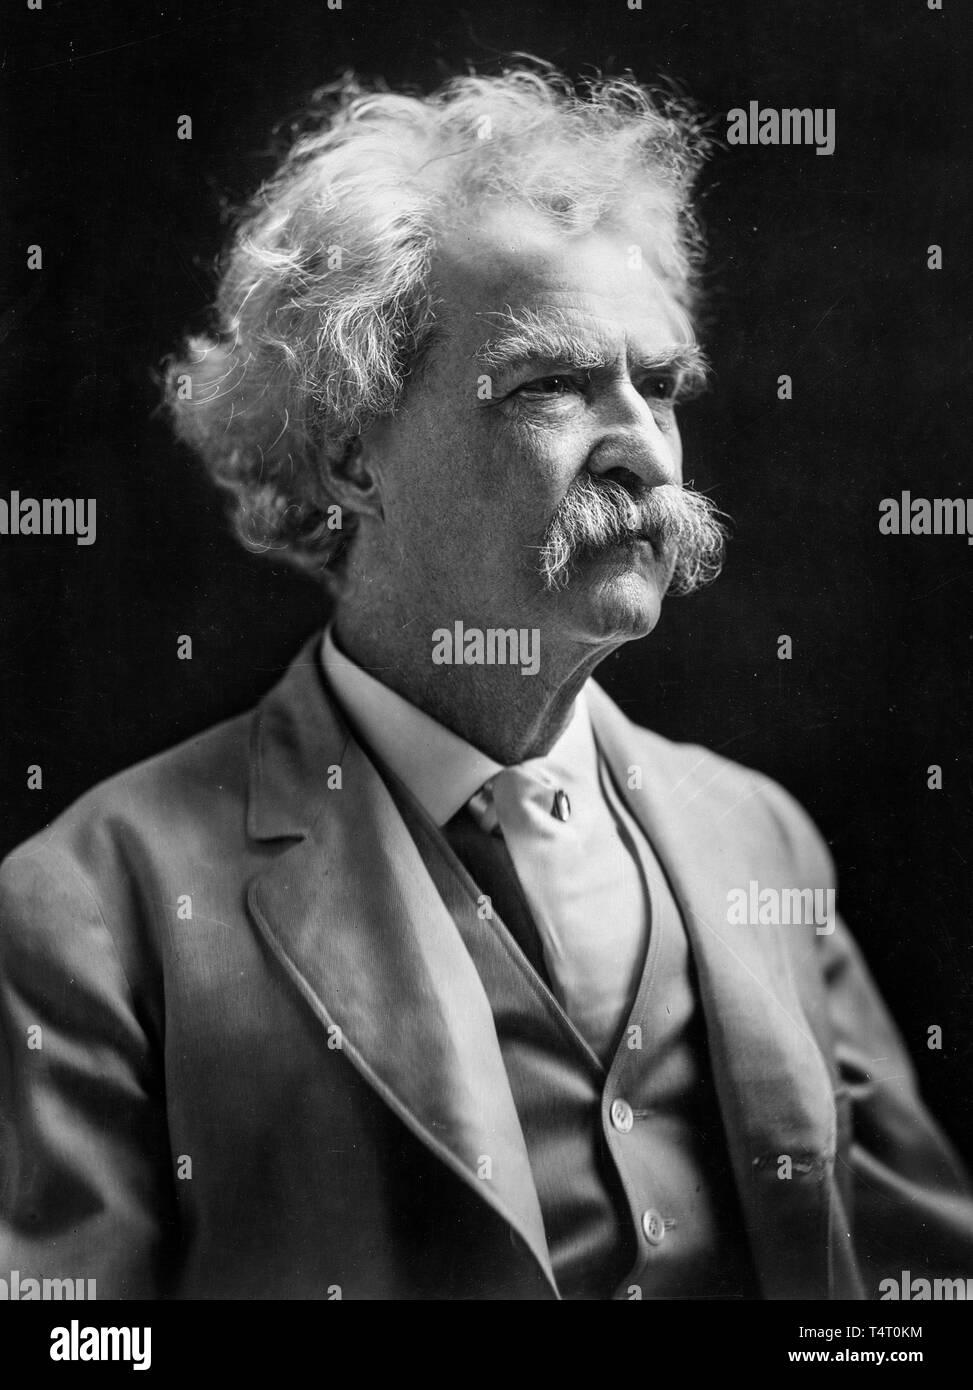 Mark Twain (1835-1910), portrait photograph, 1907 Stock Photo